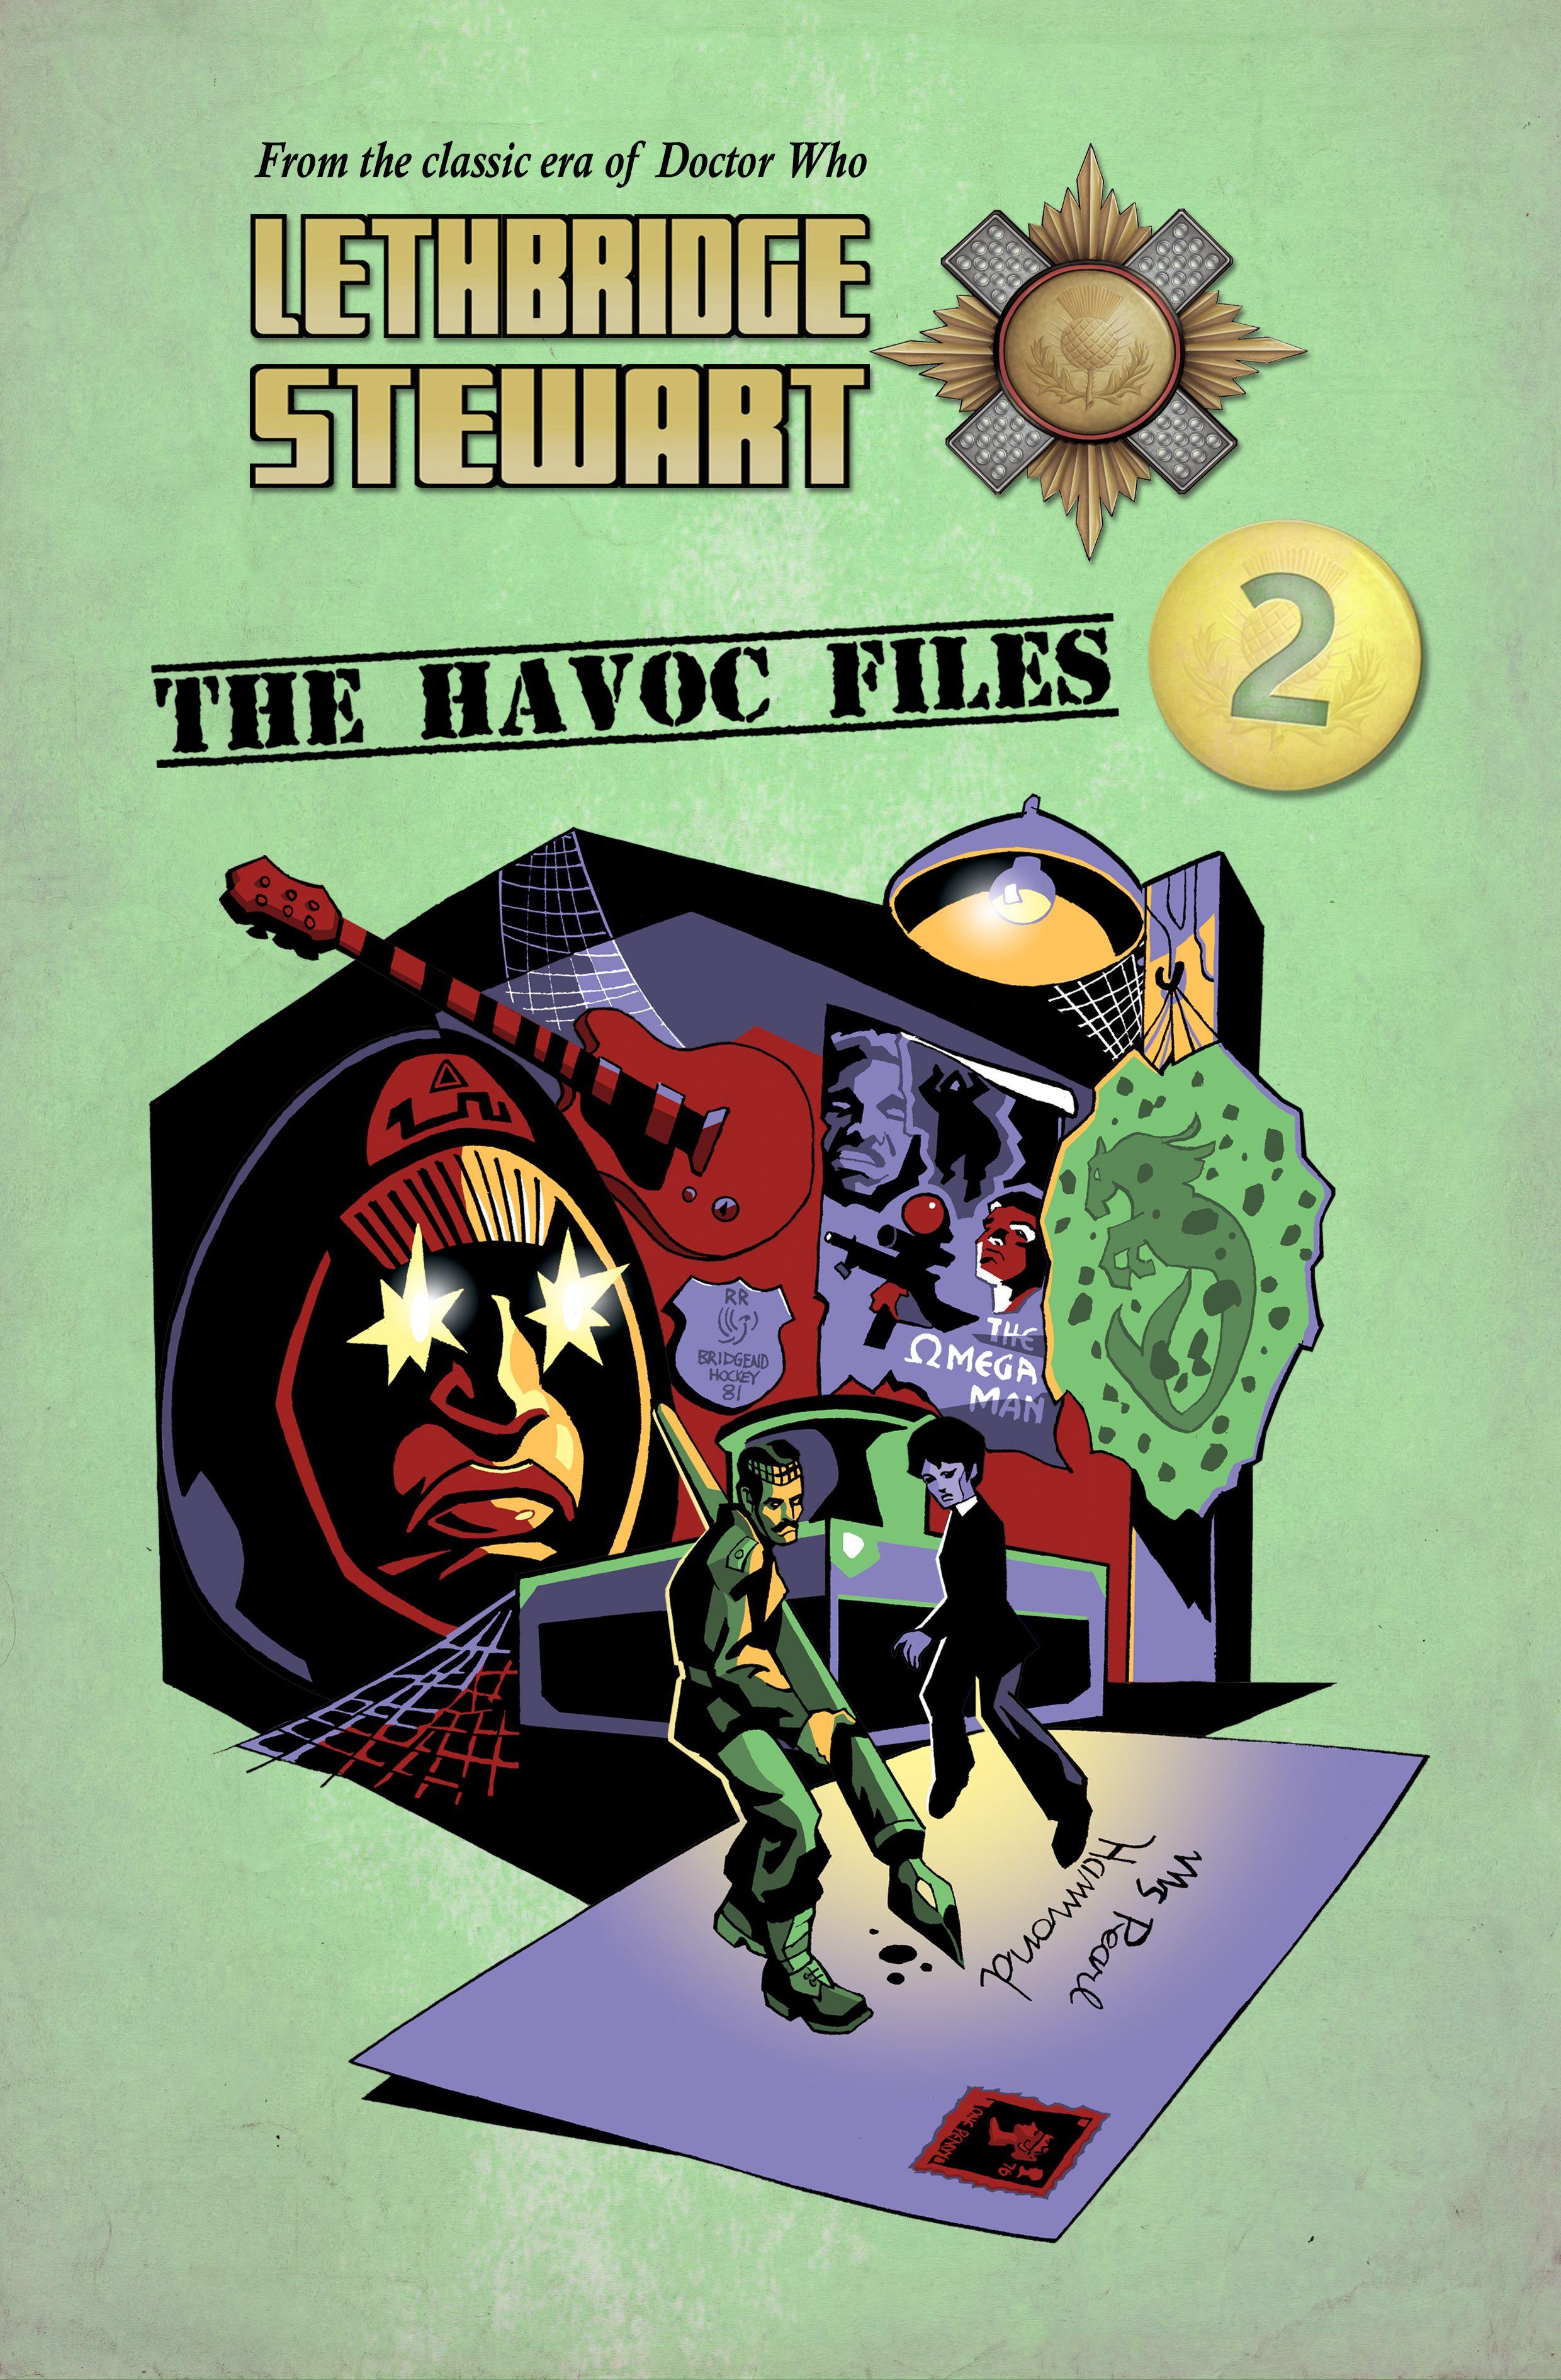 Lethbridge-Stewart: The Havoc Files 2 (Credit: Candy Jar Books)